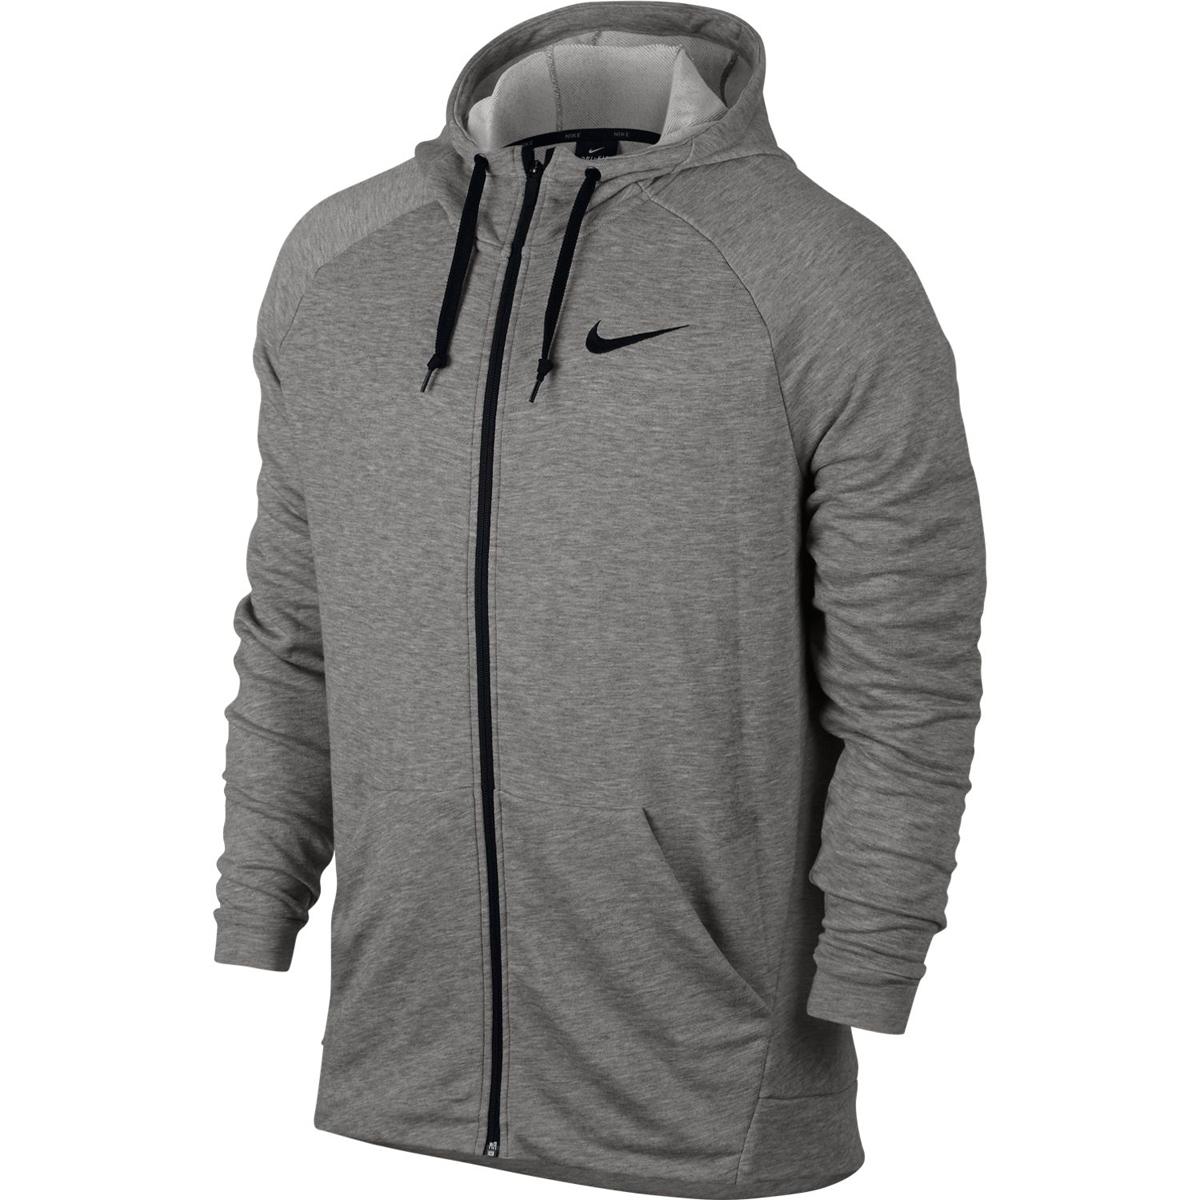 Nike Men's Dri-Fit Full-Zip Fleece Training Hoodie - Black, XL